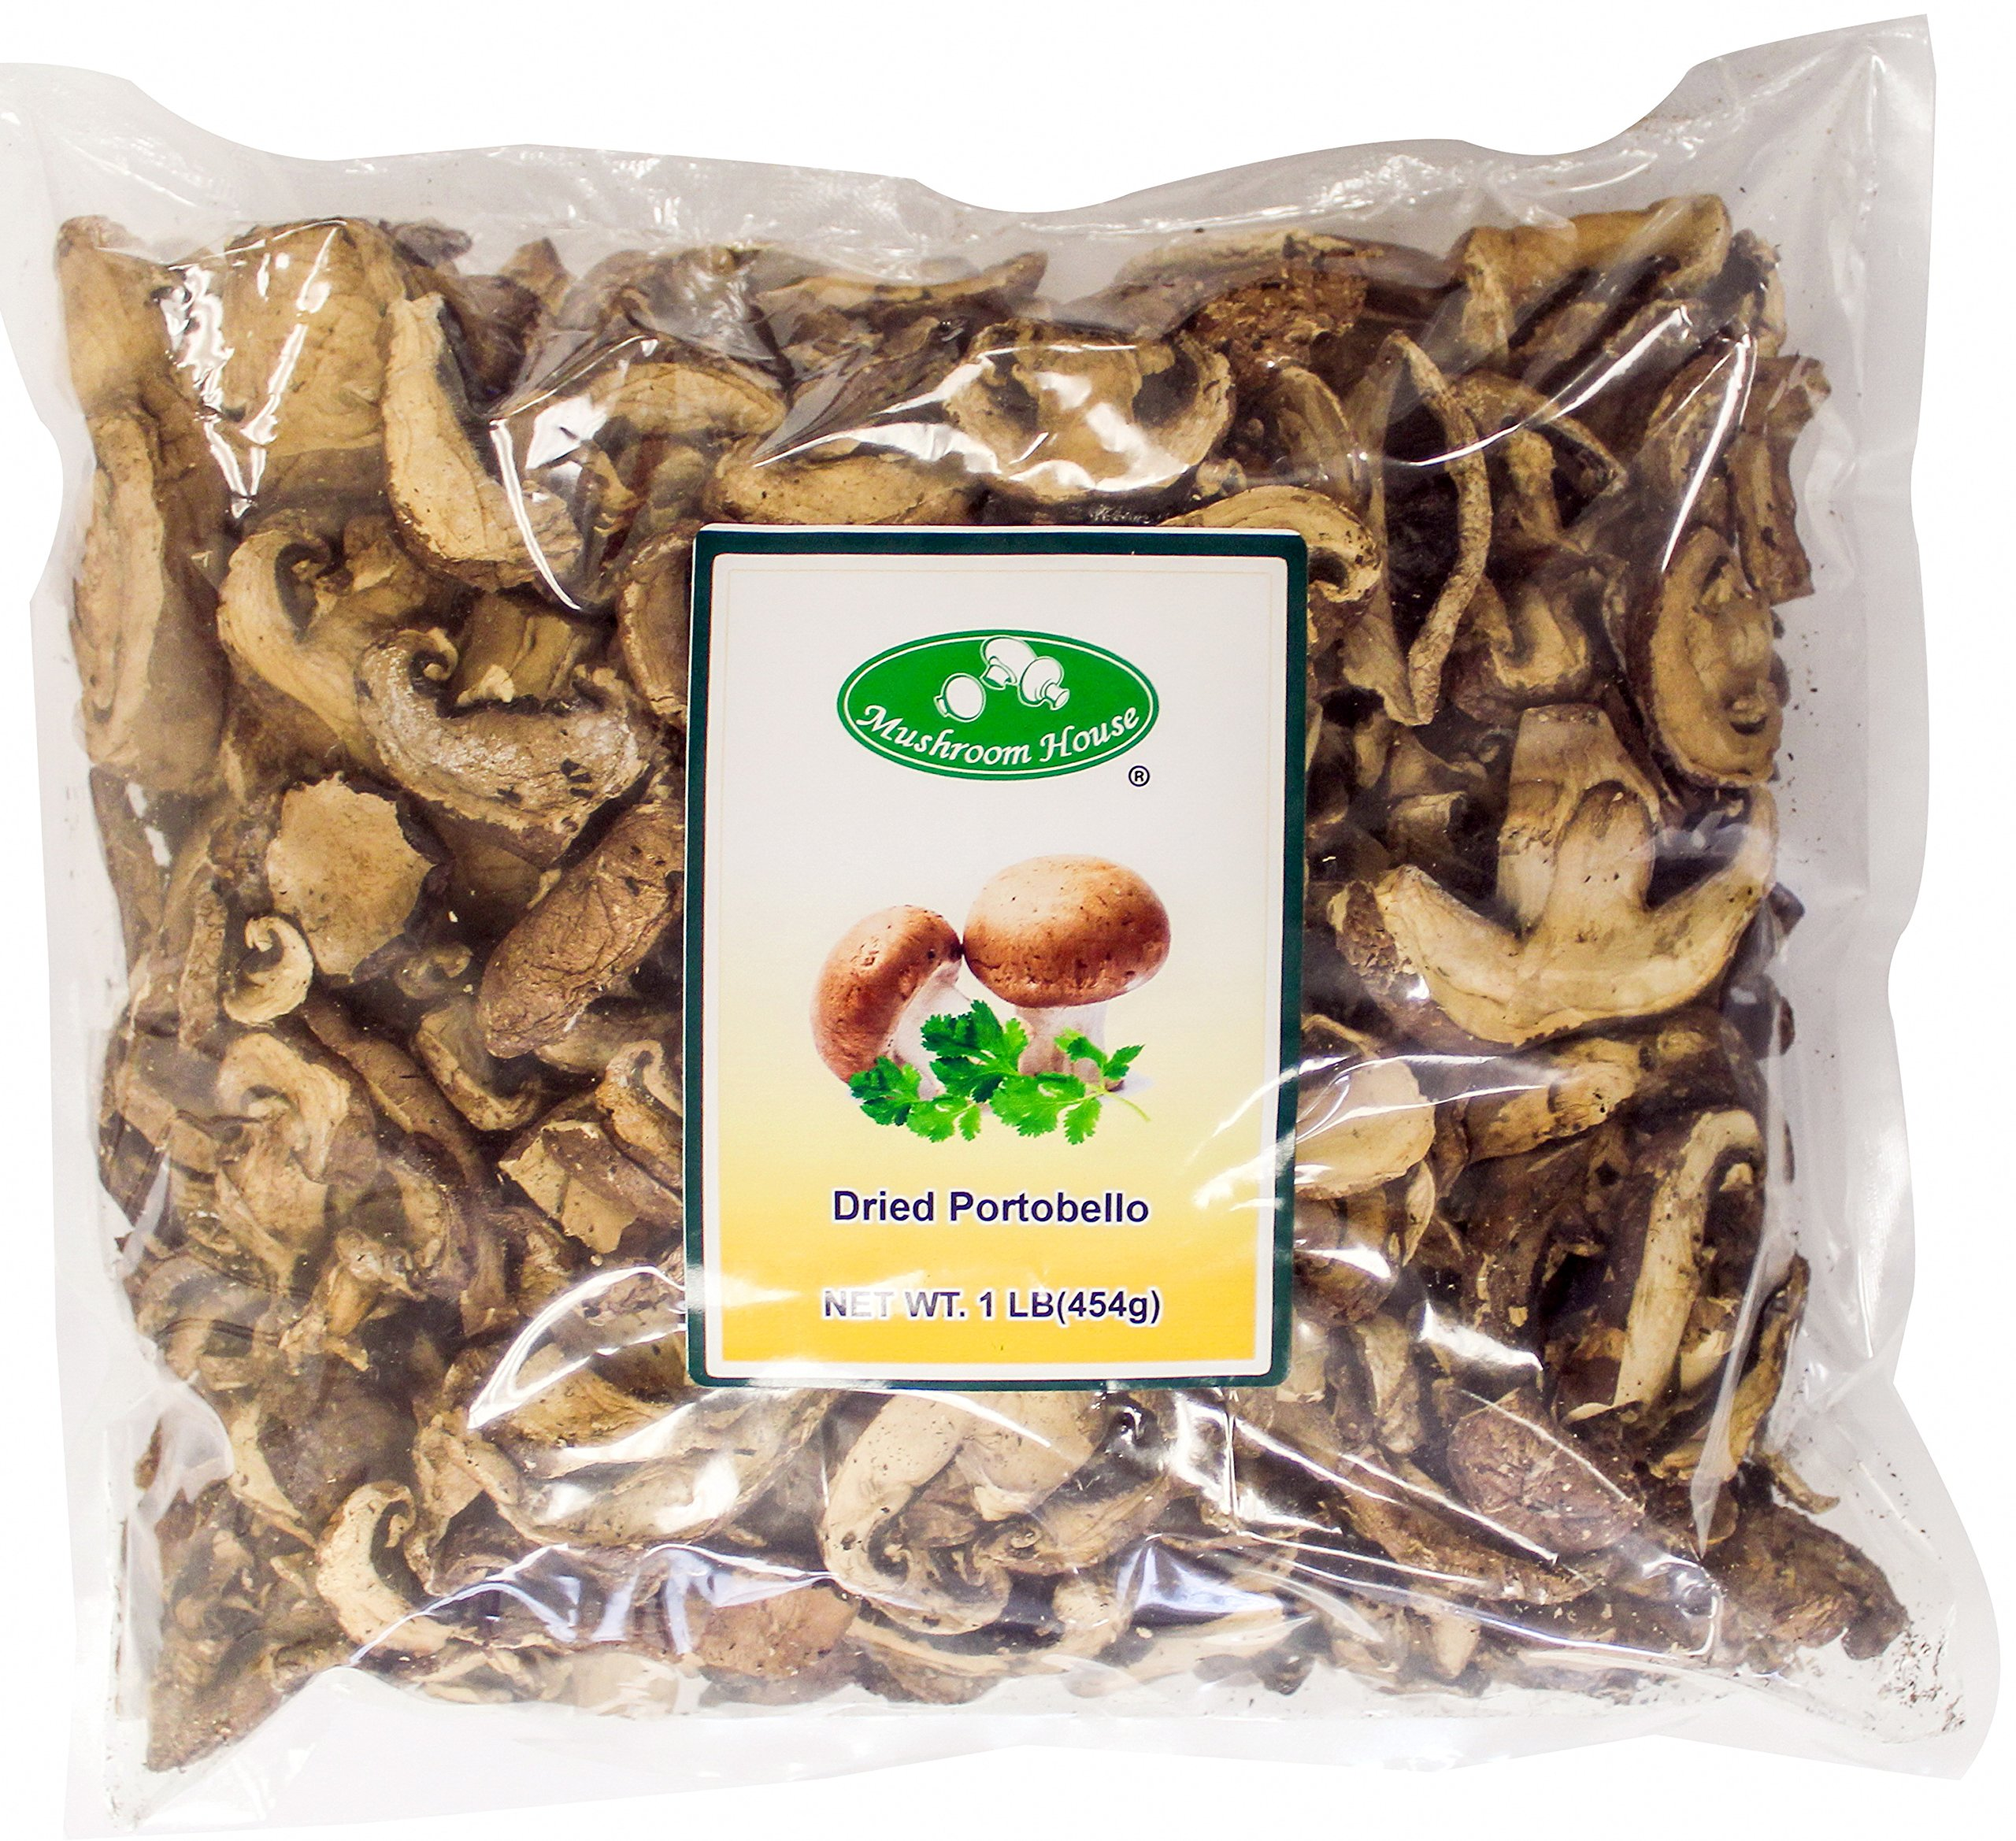 Mushroom House Dried Portobello Mushroom Slices, 1 Pound